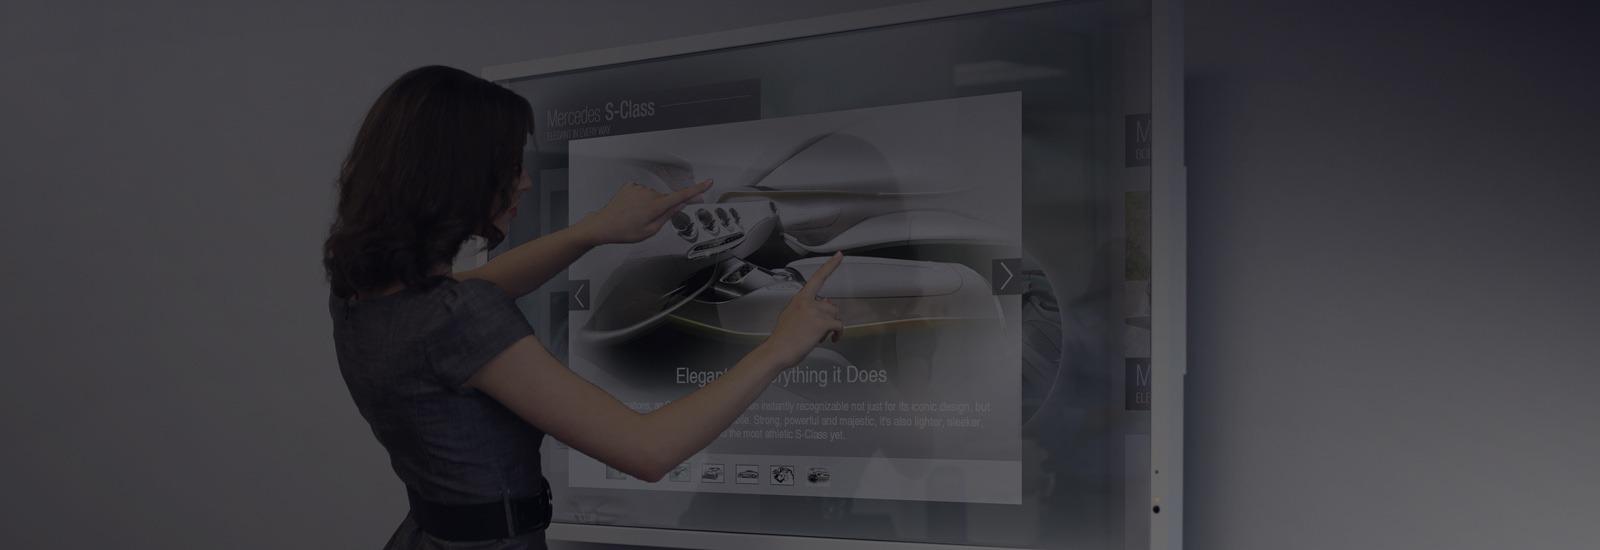 Multi-touch Monitors